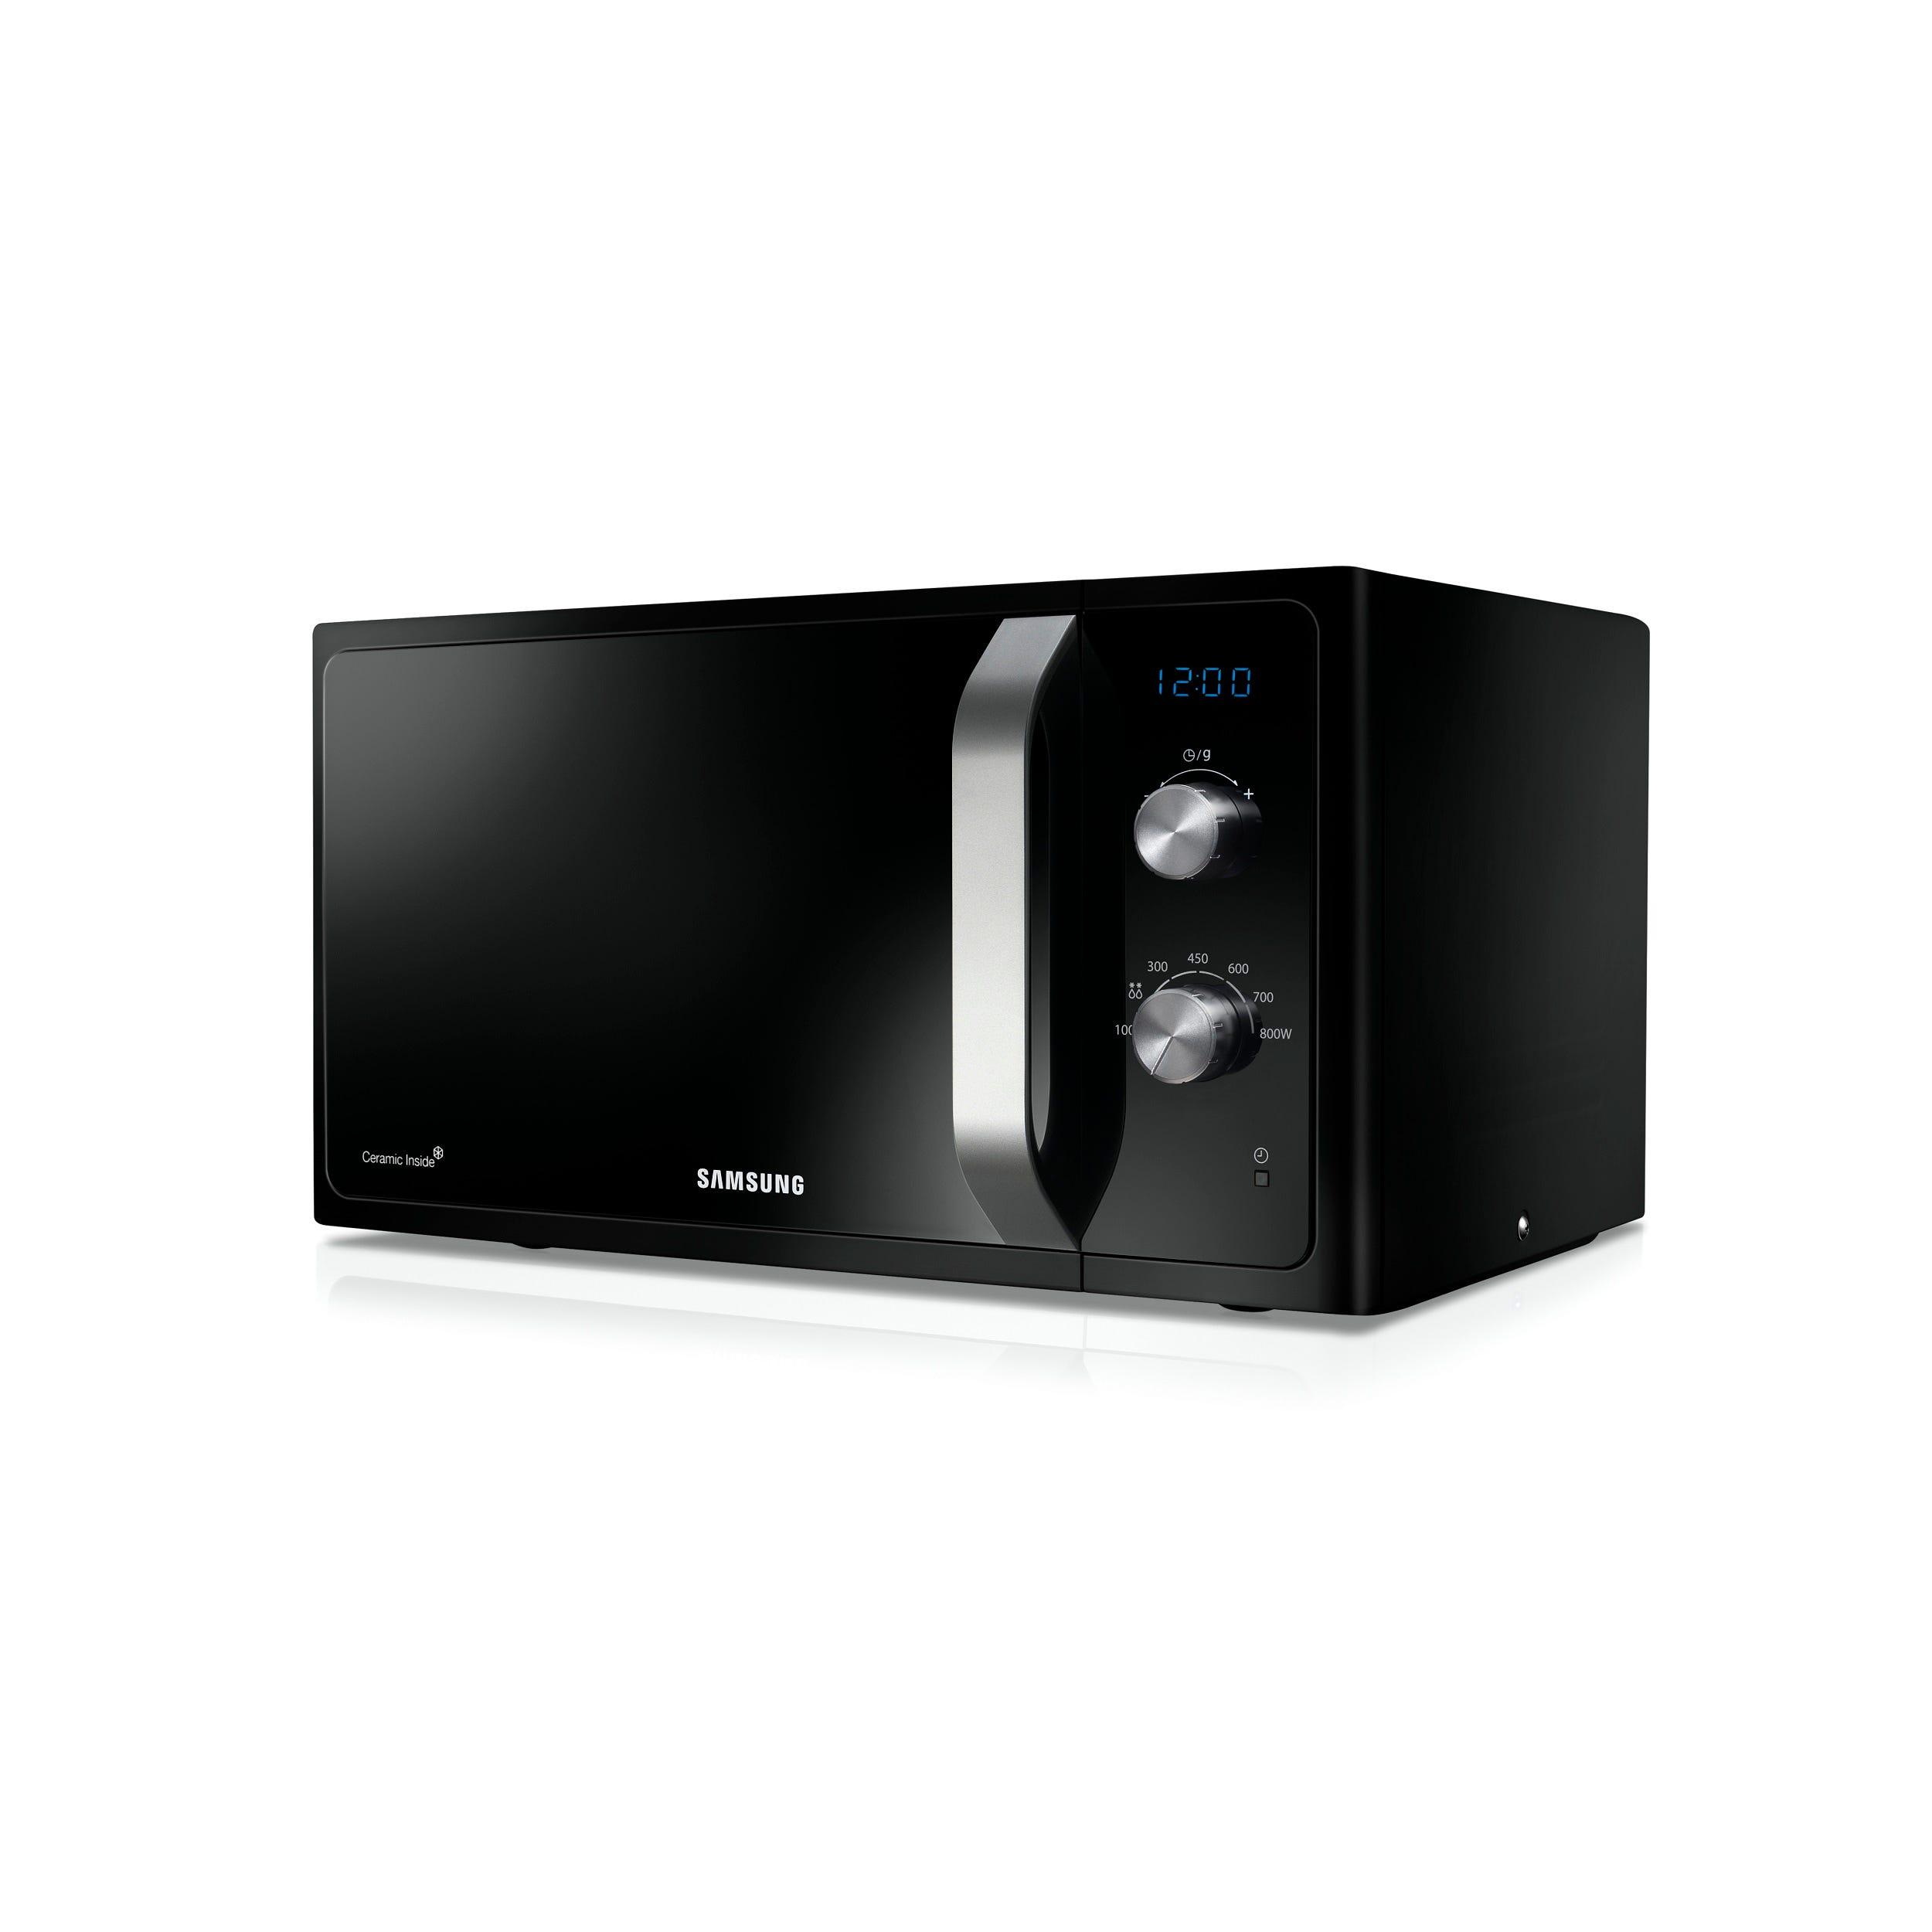 Samsung Solo 23L Microwave Black